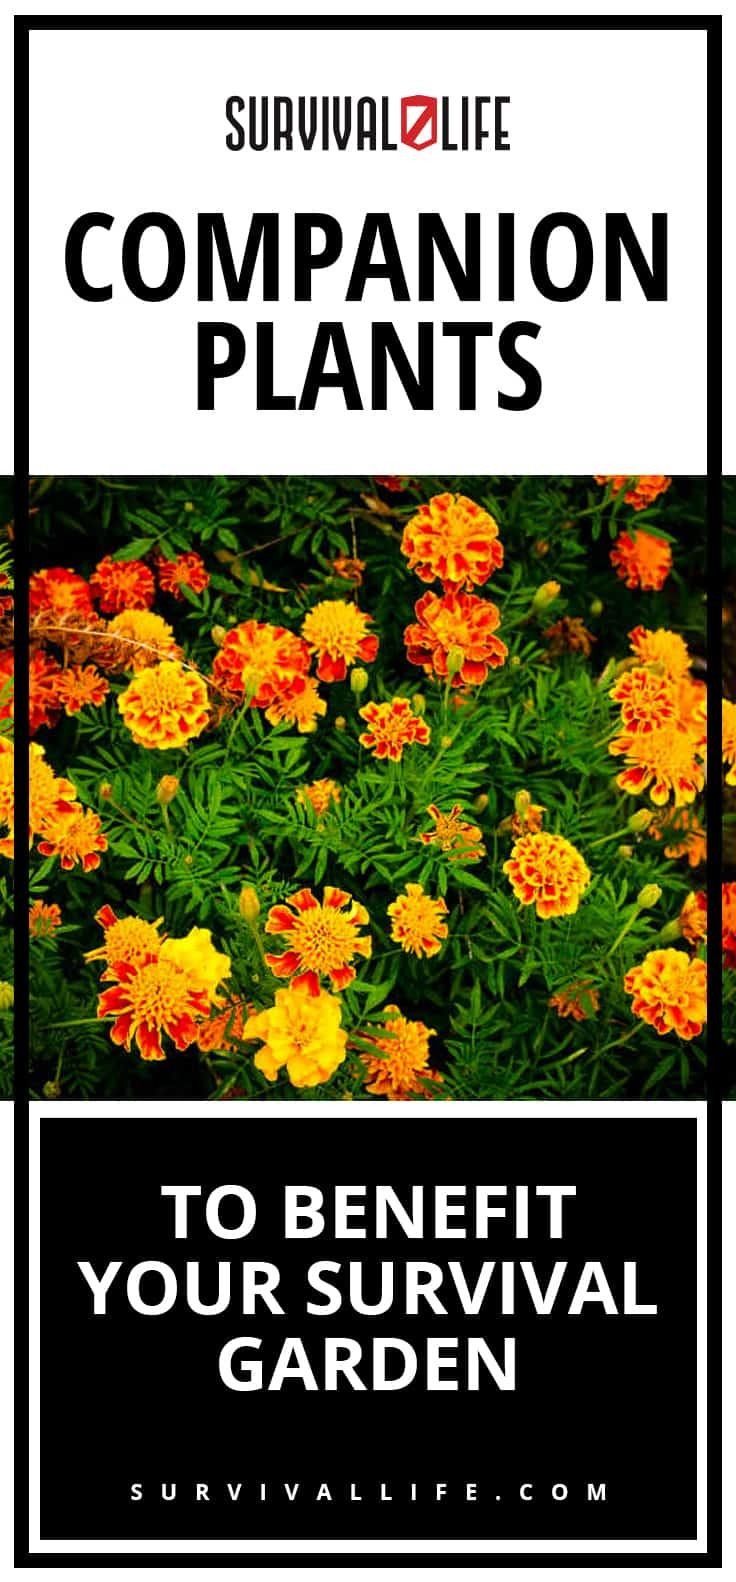 Companion Plants To Benefit Your Survival Garden [Survival Life]